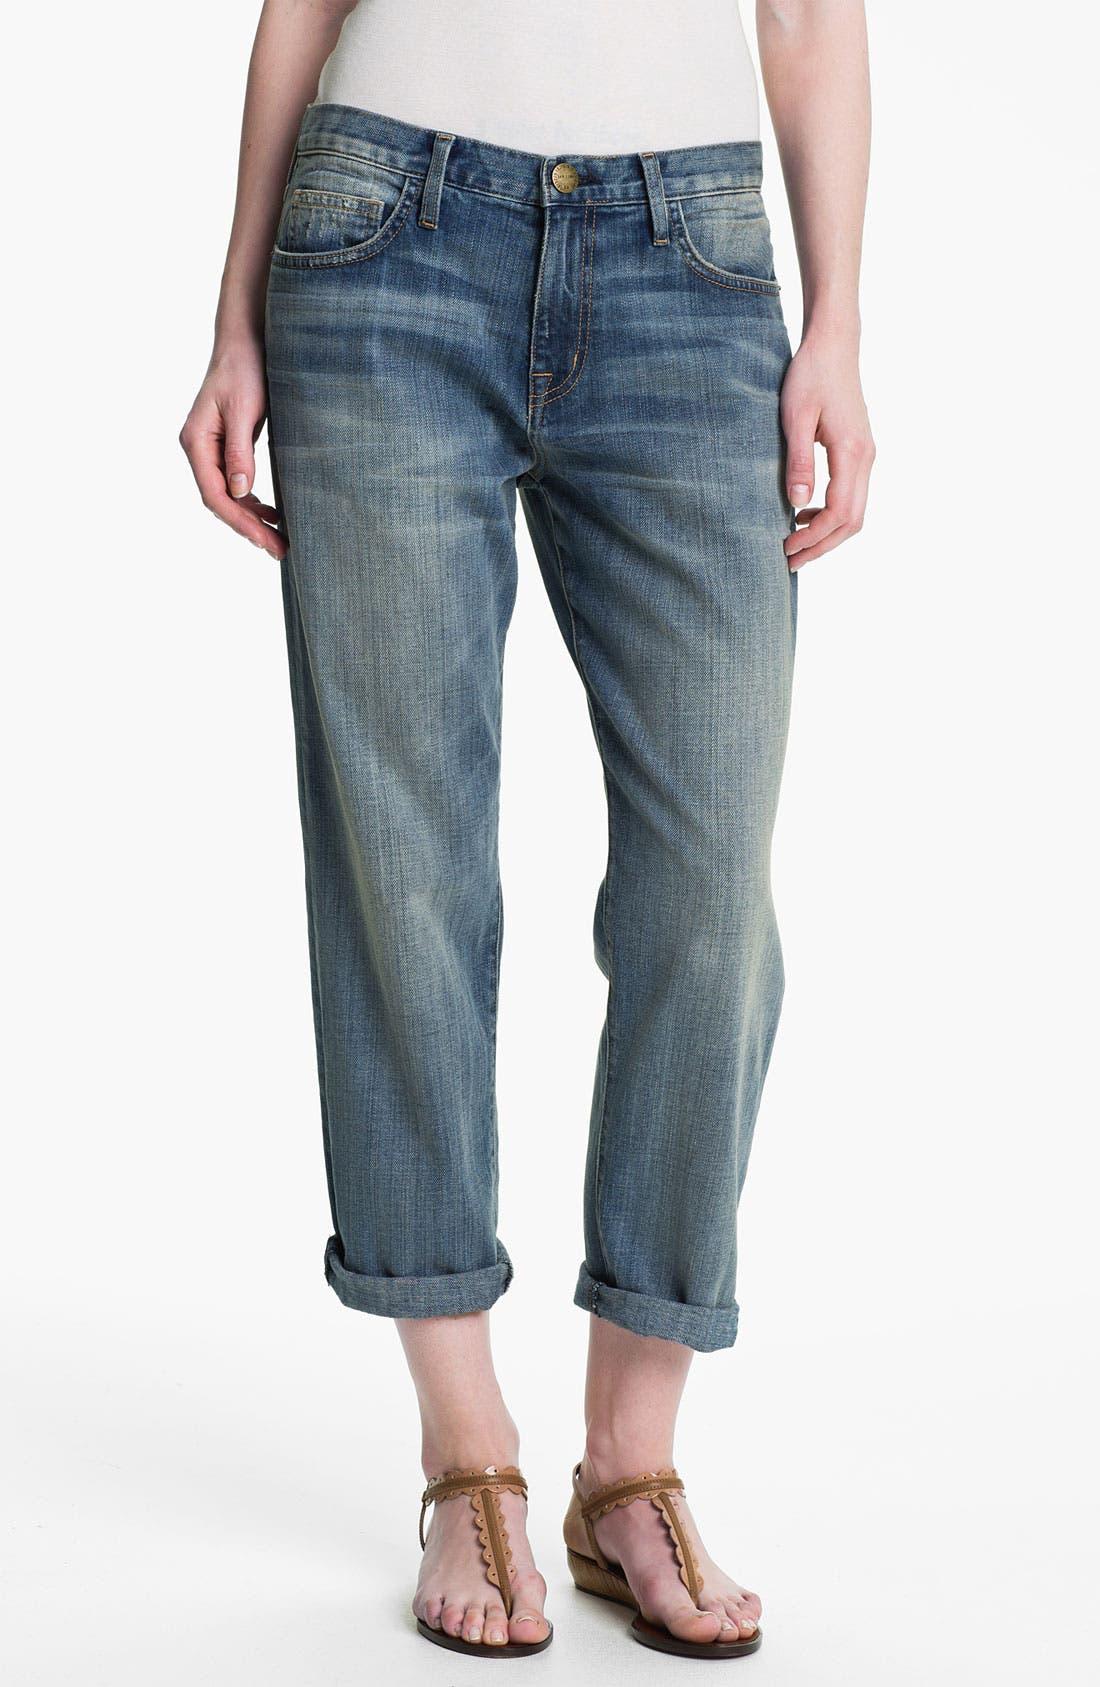 Main Image - Current/Elliott 'The Boyfriend Jean' Jeans (Super Loved)